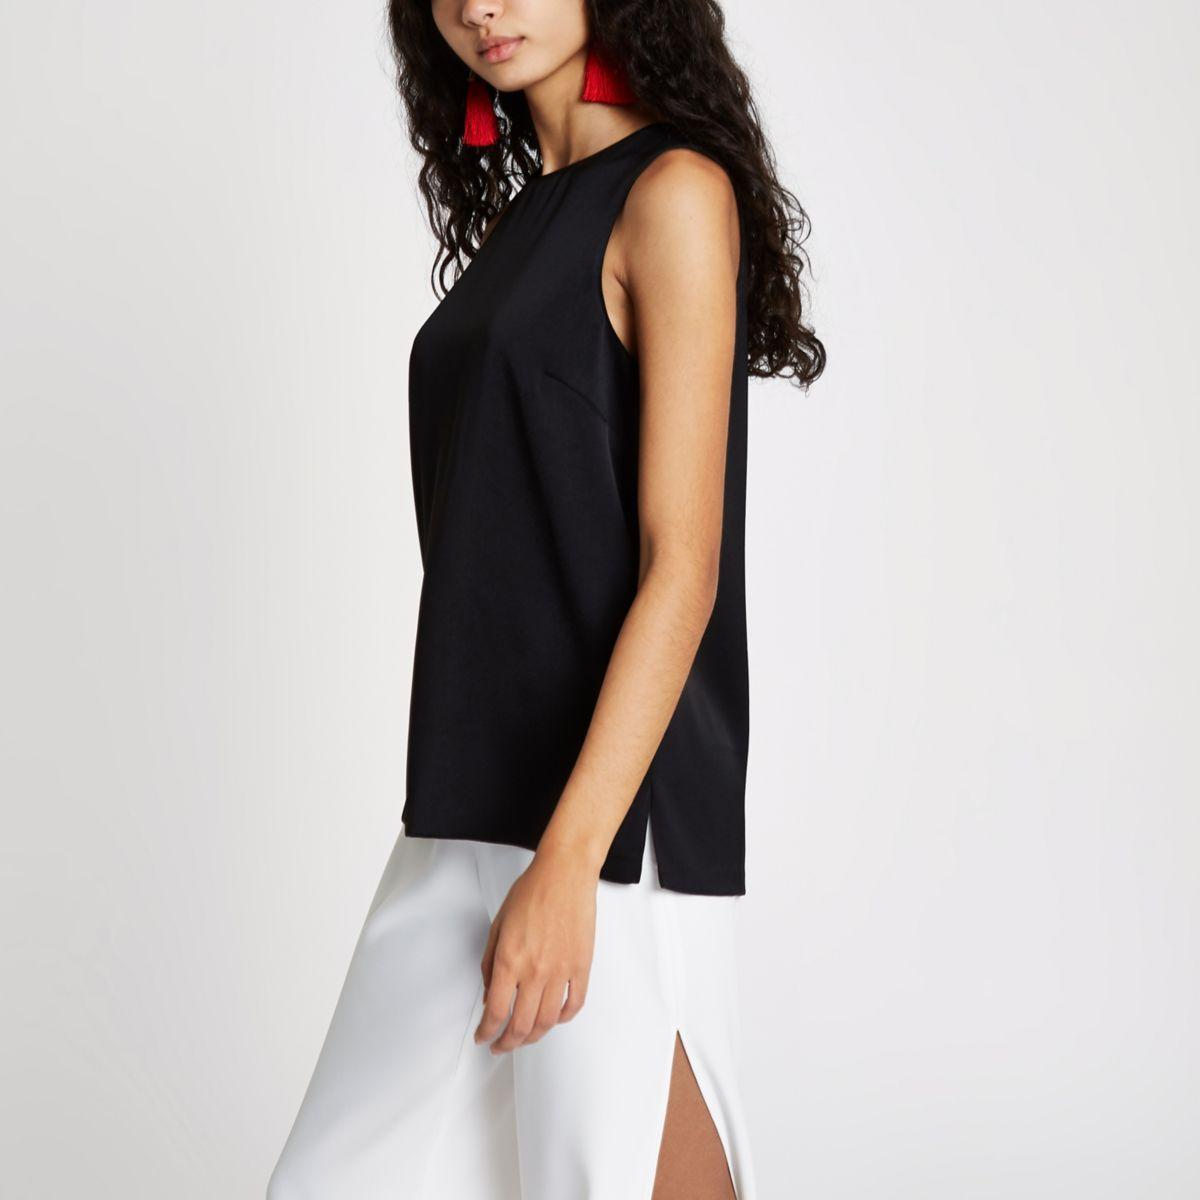 Black jacquard sleeveless top